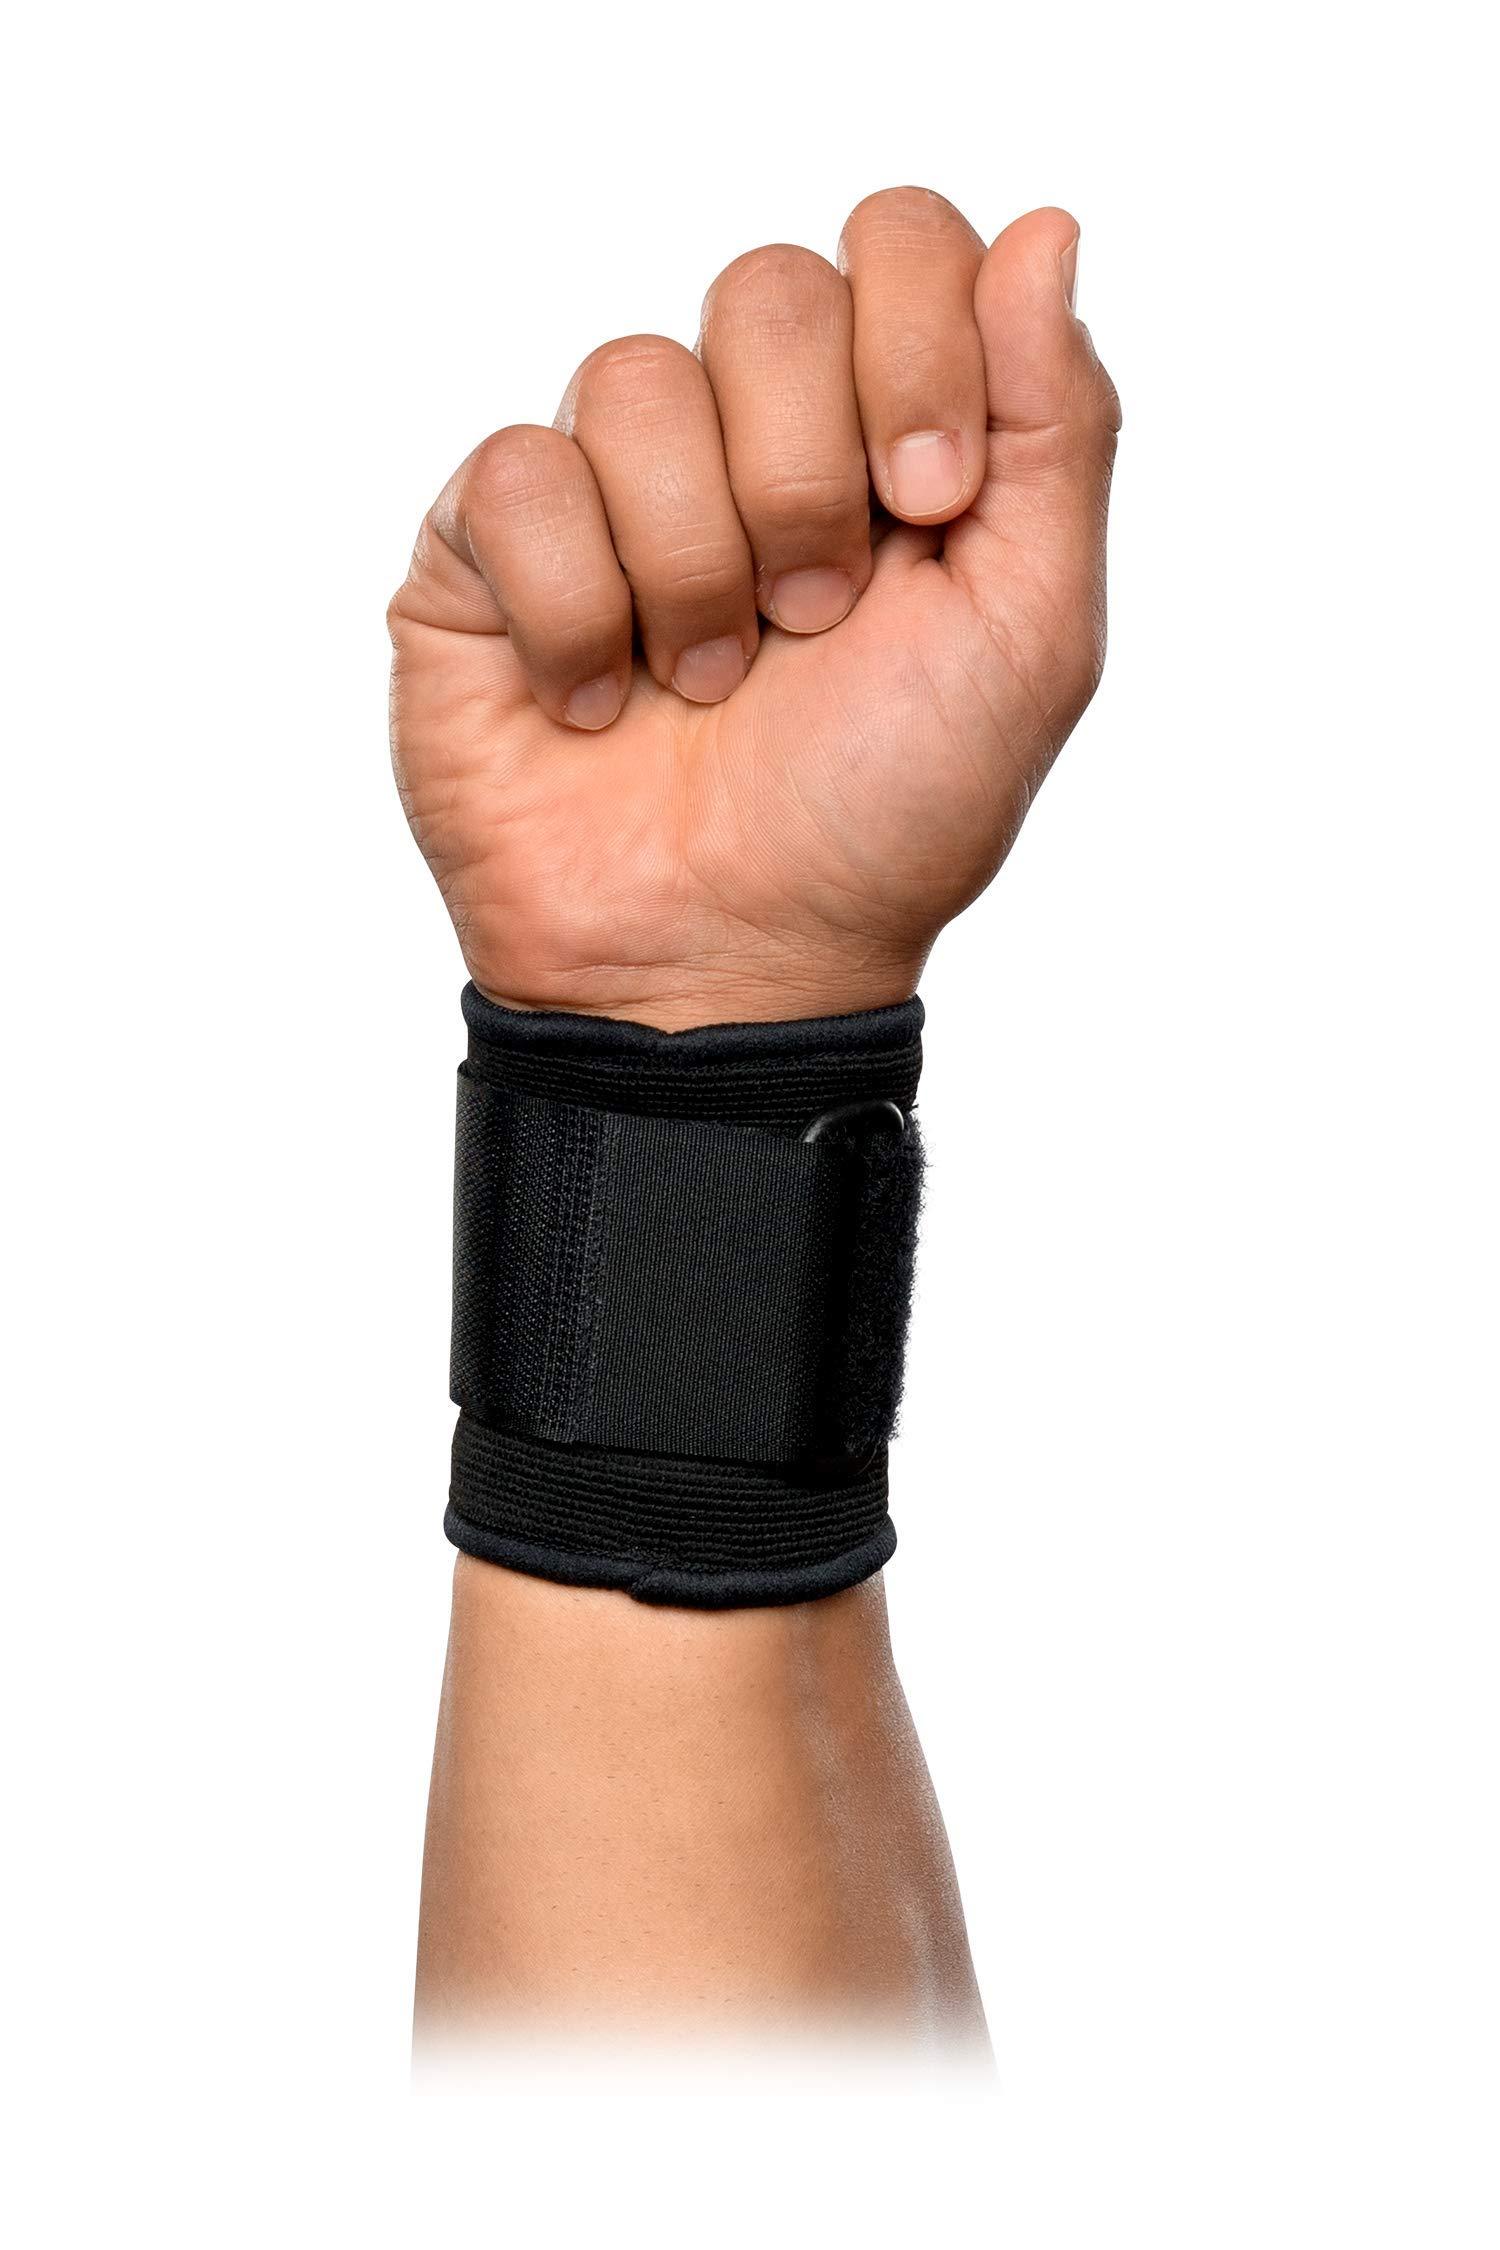 McDavid 513 Elastic Wrist Support, Large/X-Large by McDavid (Image #5)